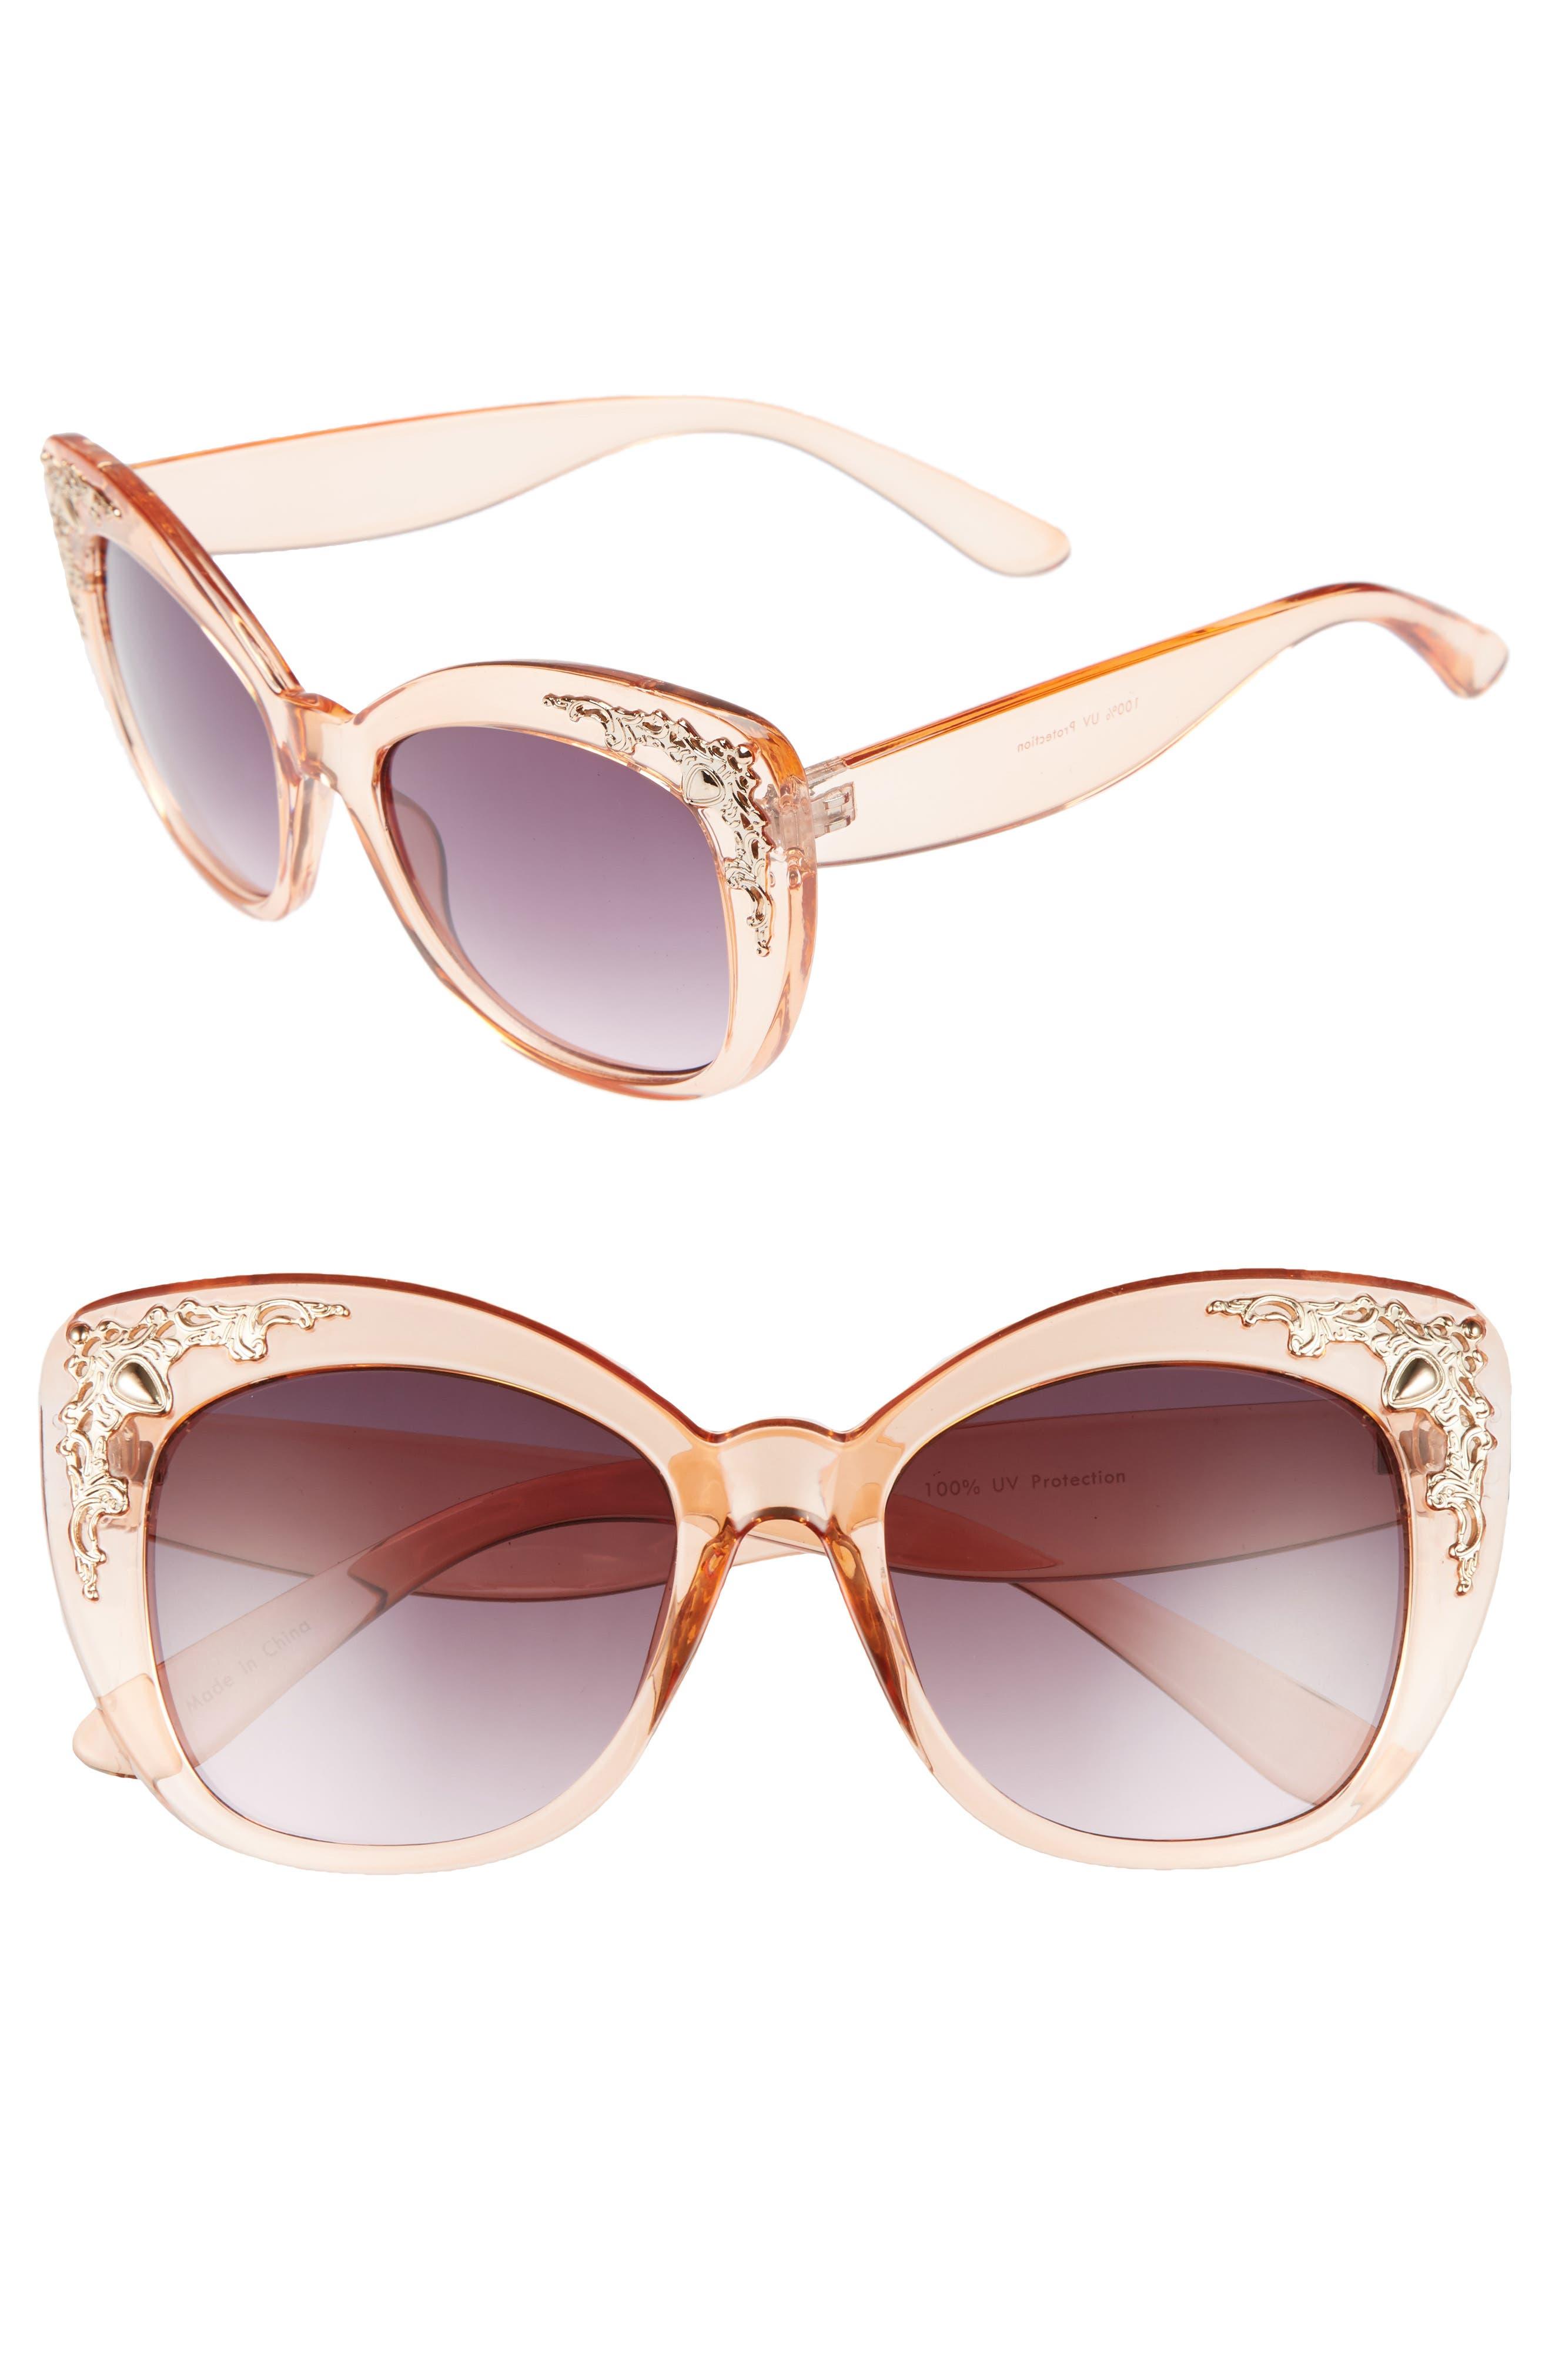 54mm Embellished Cat Eye Sunglasses,                             Main thumbnail 1, color,                             710